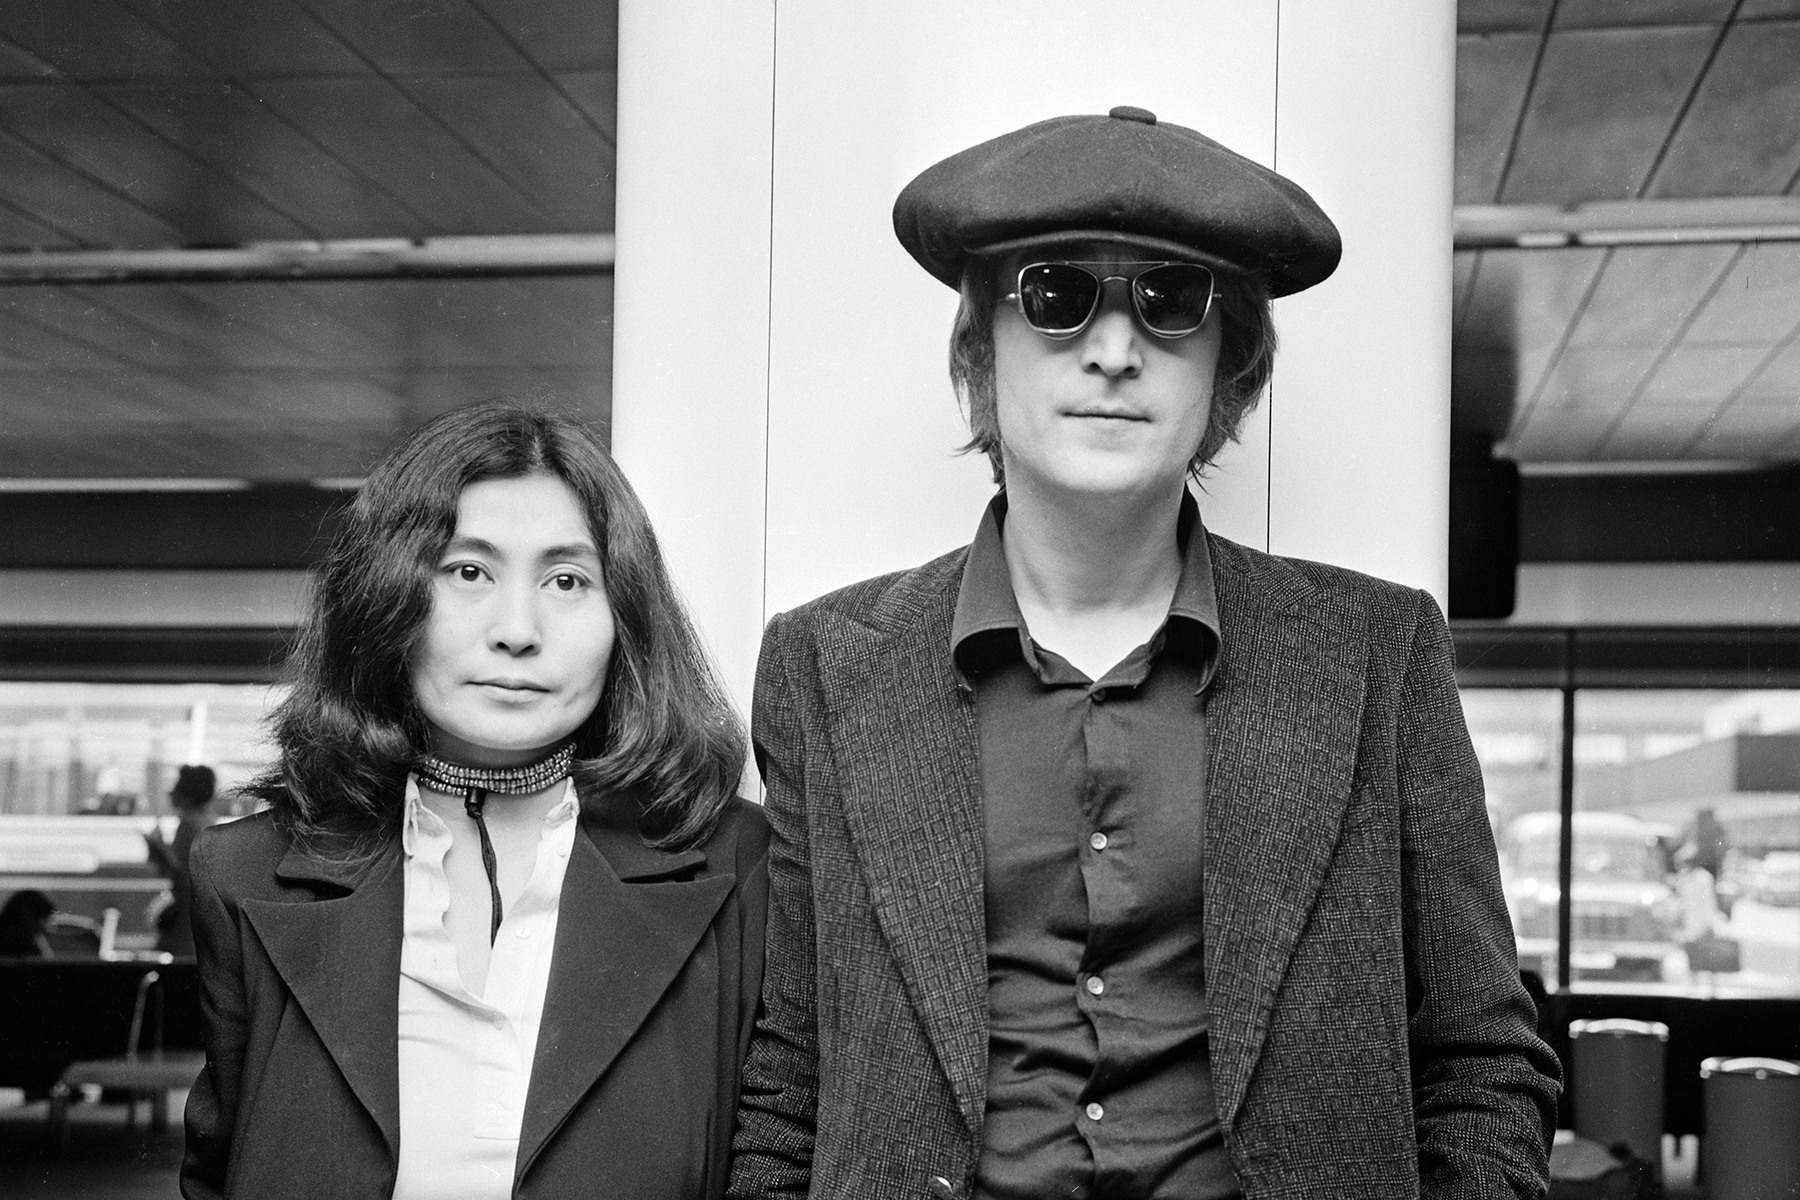 'John Lennon/Plastic Ono Band' Gets Massive 50th-Anniversary Reissue